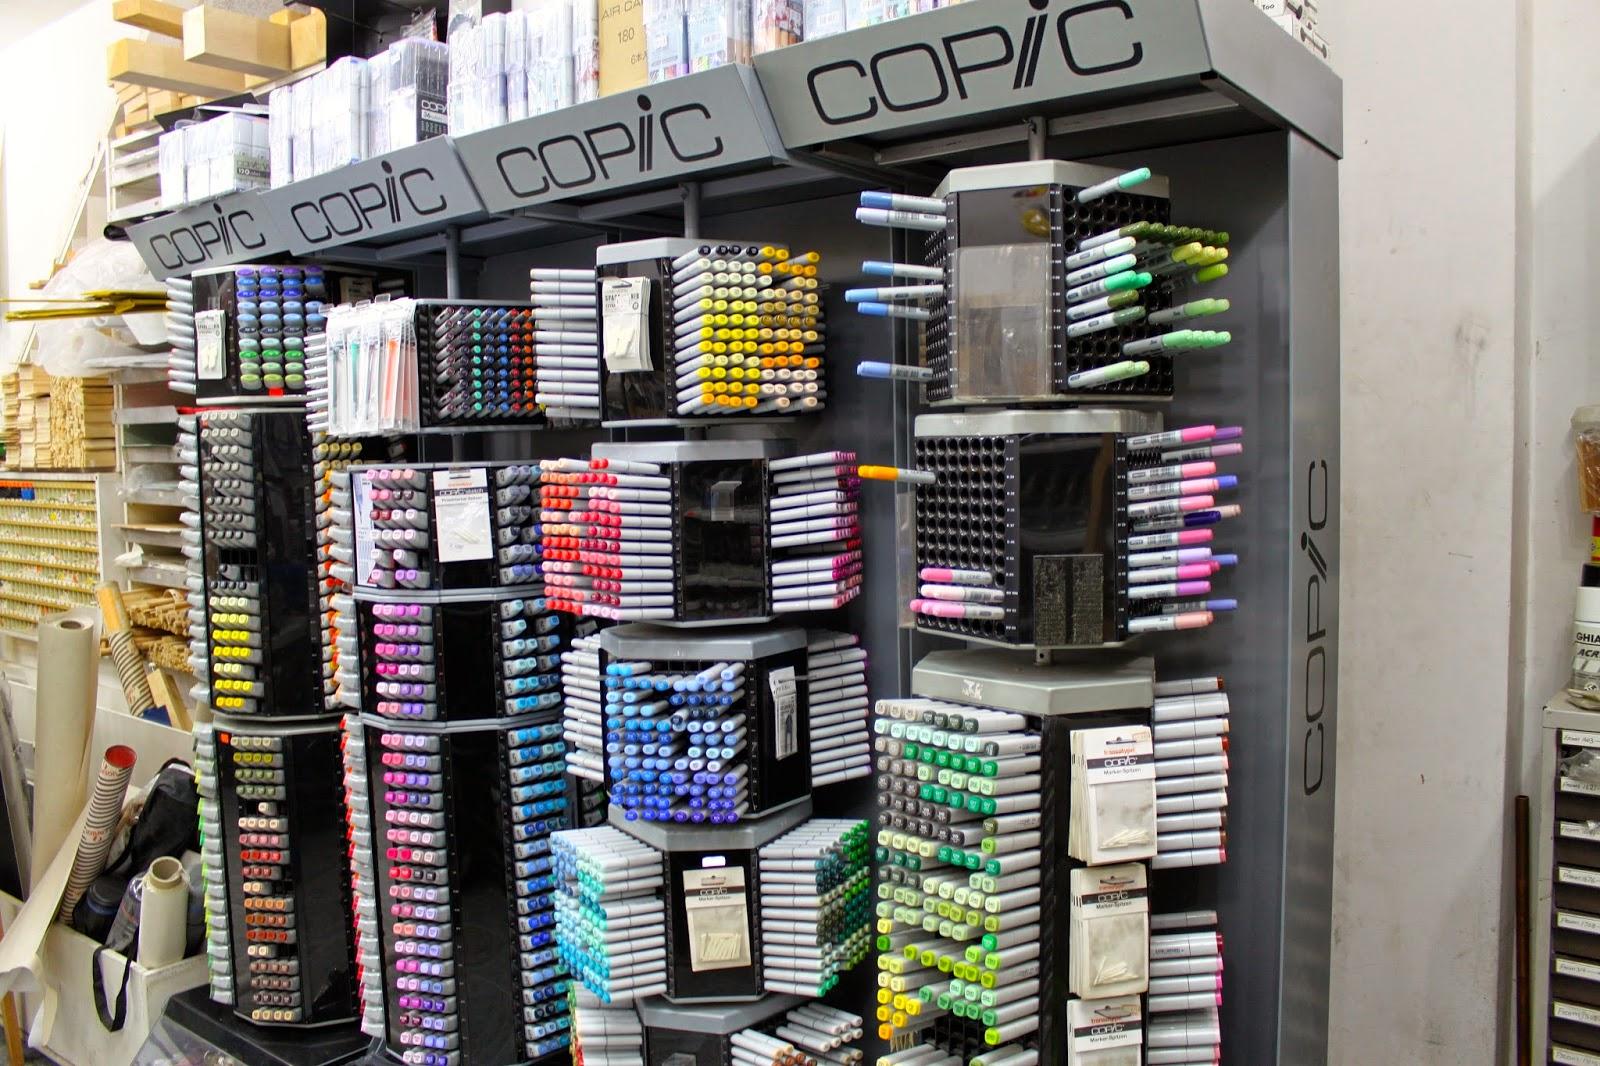 Ilulz Blog: [Review] Art Shops In Kuwait